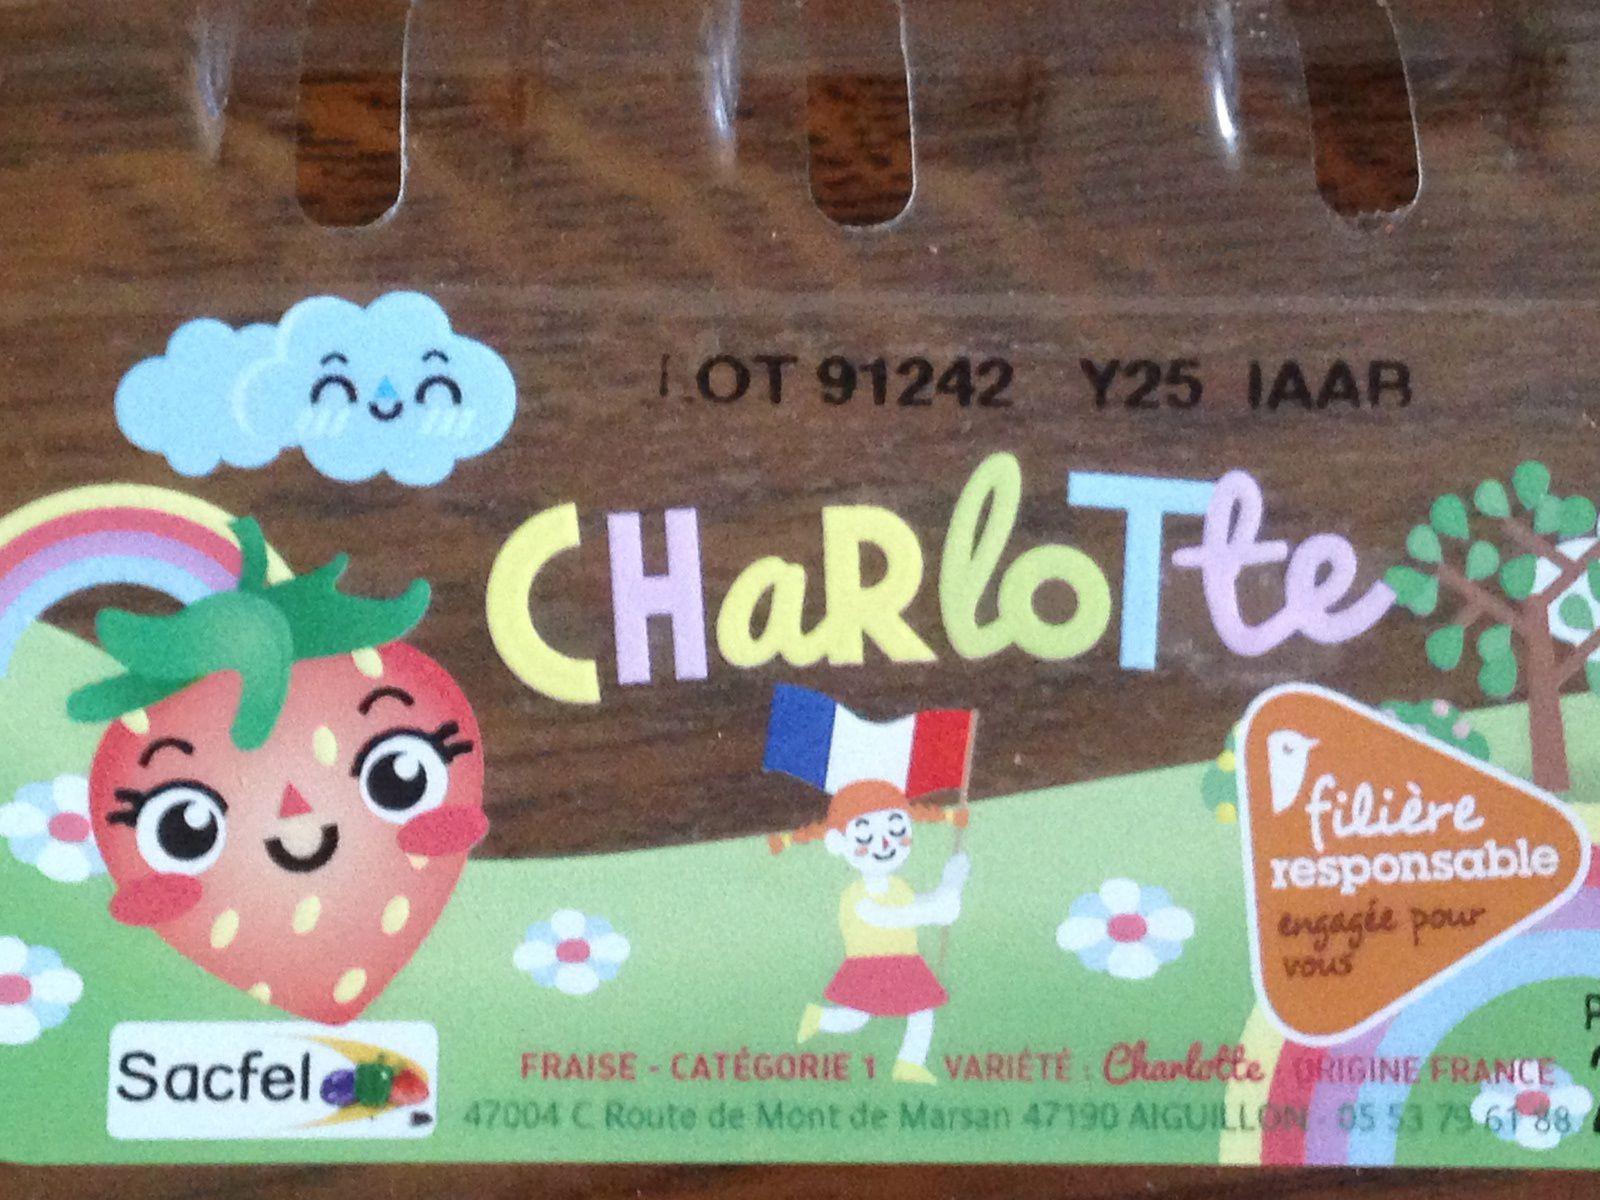 #fraise #charlotteblabla blog